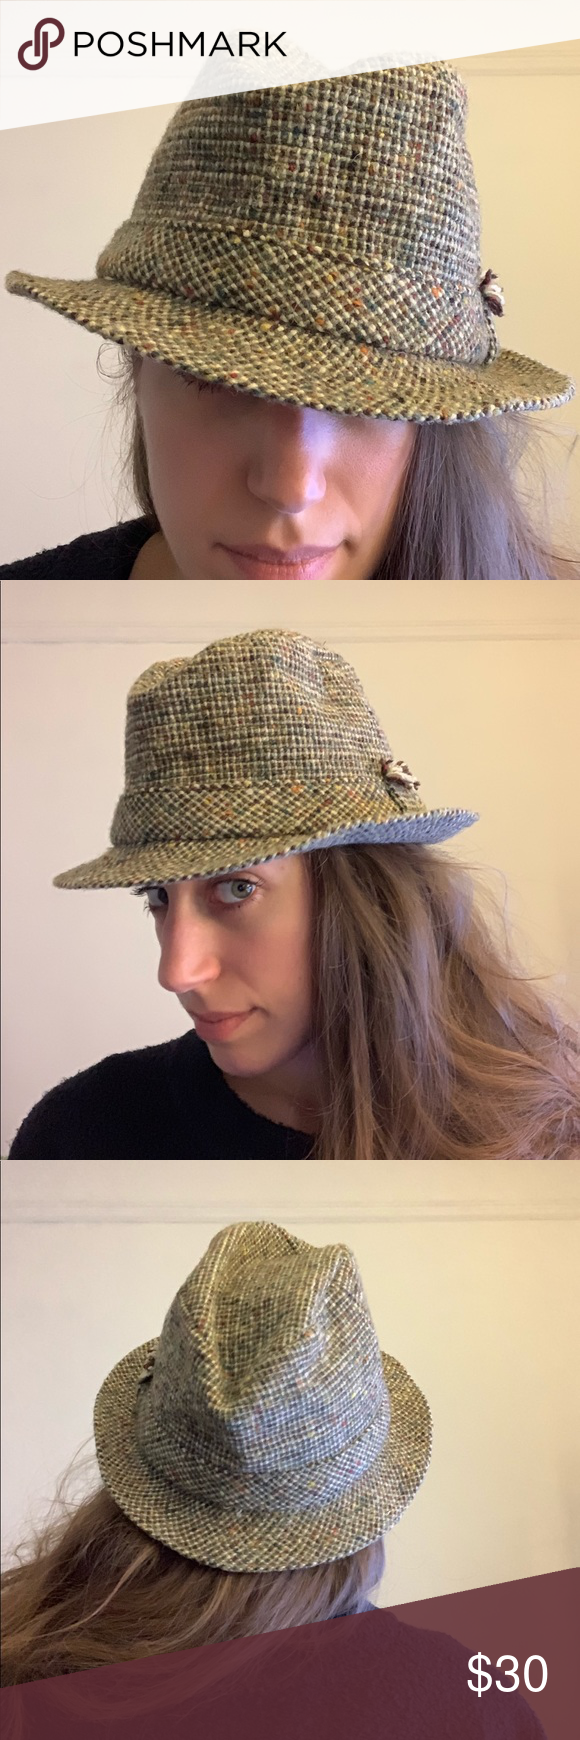 a0221dce5da Vintage • tweed wool fedora hat Great vintage condition - David Hanna    Sons Scottish brand